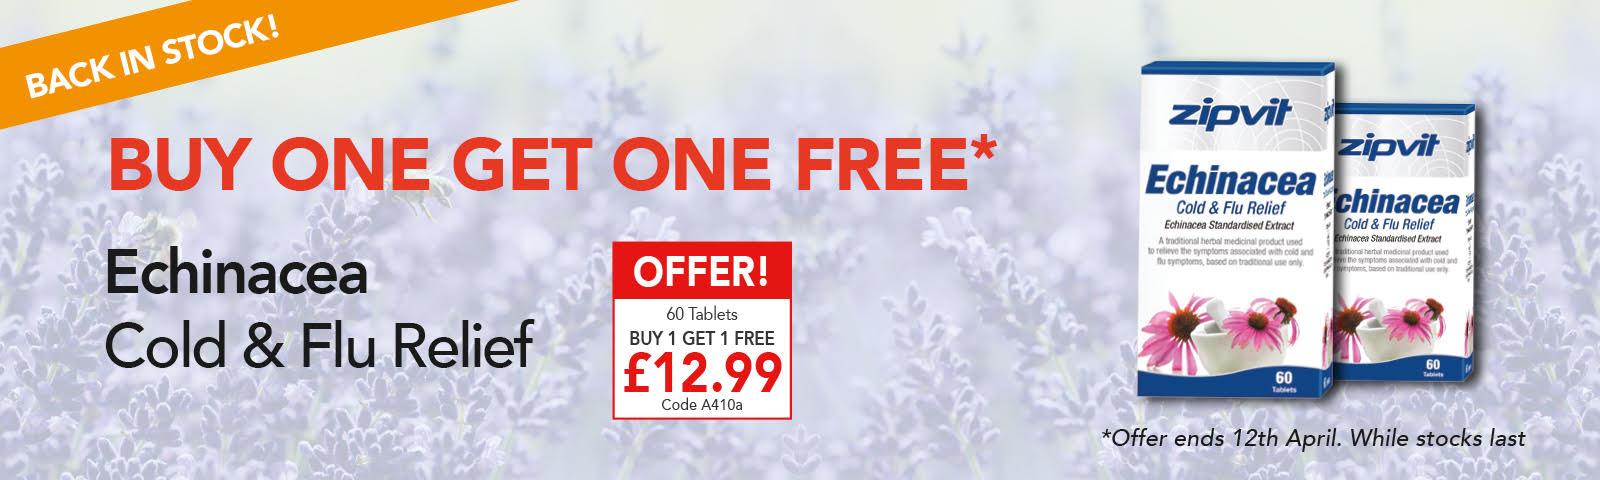 Buy 1 Get 1 Free Echinacea